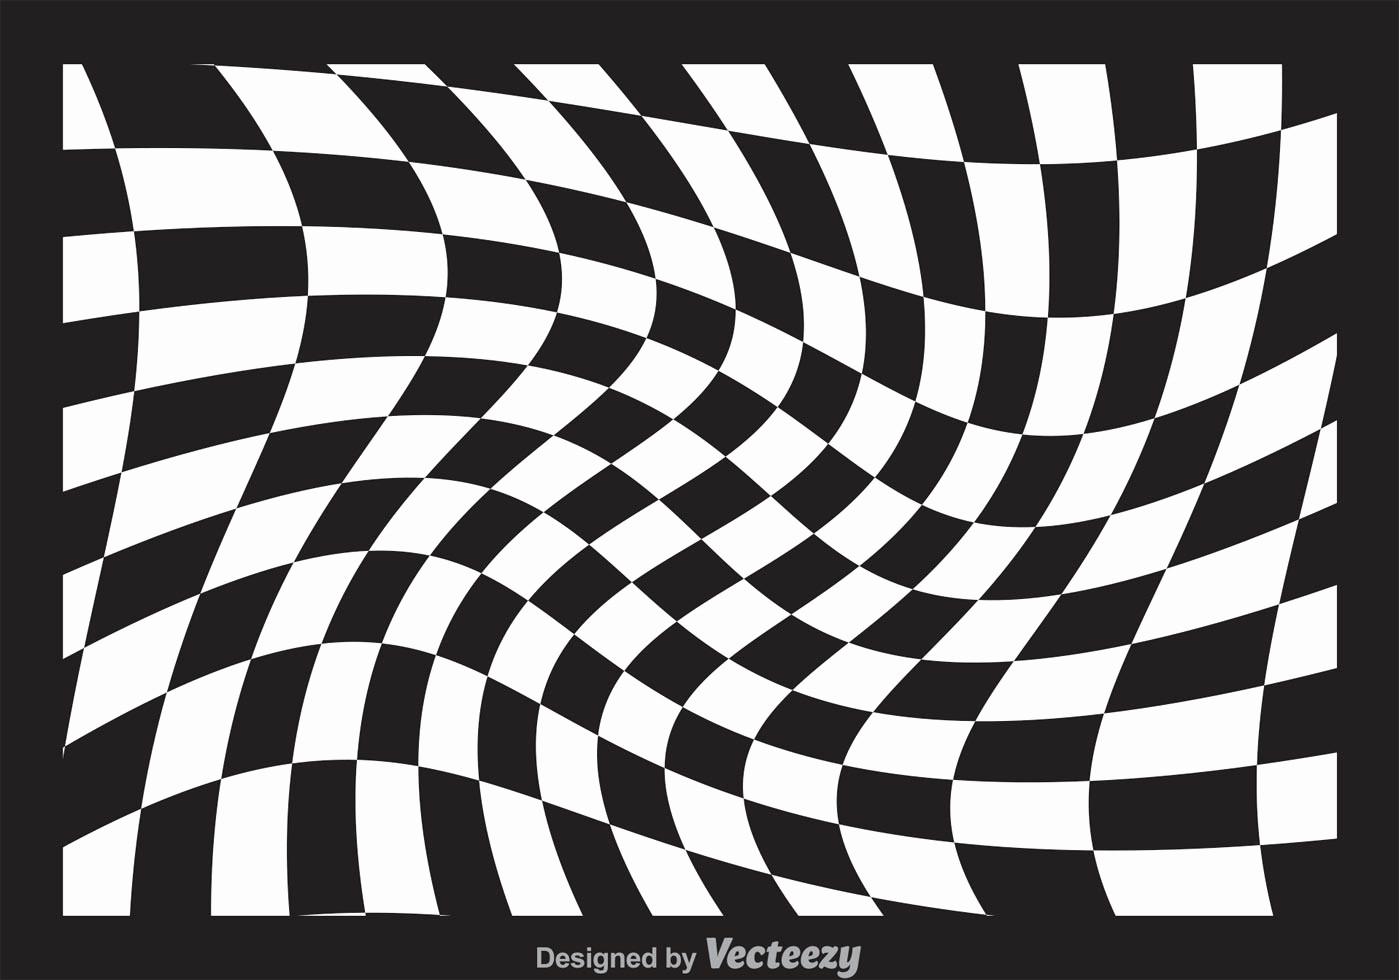 Pictures Of A Checker Board Unique Distorted Checker Board Vector Download Free Vector Art